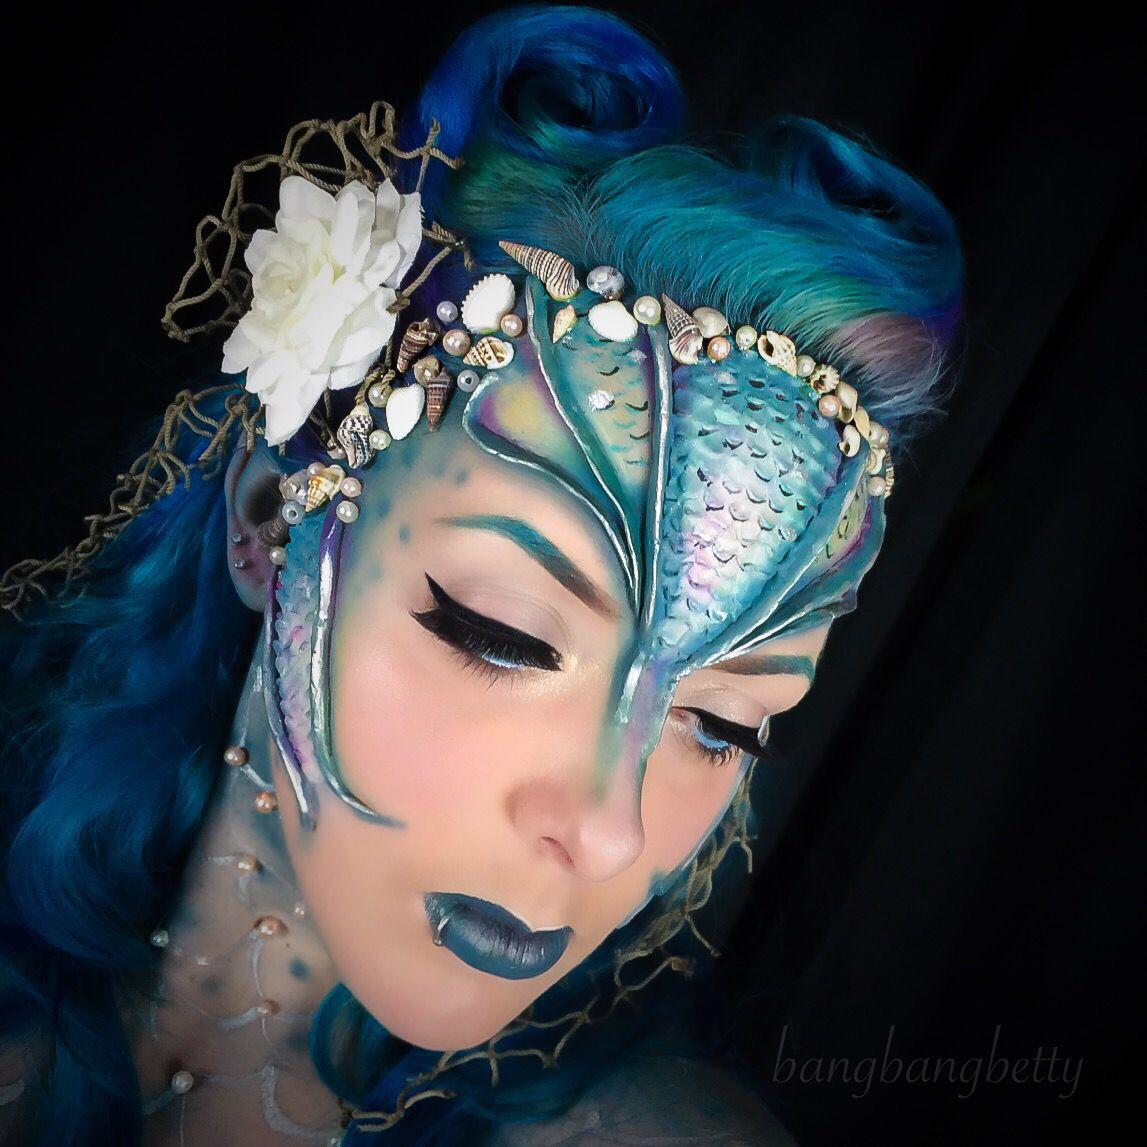 I Decided To Be A Pinup Mermaid Today Mermaid Makeup Blue Mermaid Scales Makeup Blue Hair Sea Creature Makeup Eye Makeup Tutorial Blue Makeup Nerd Makeup